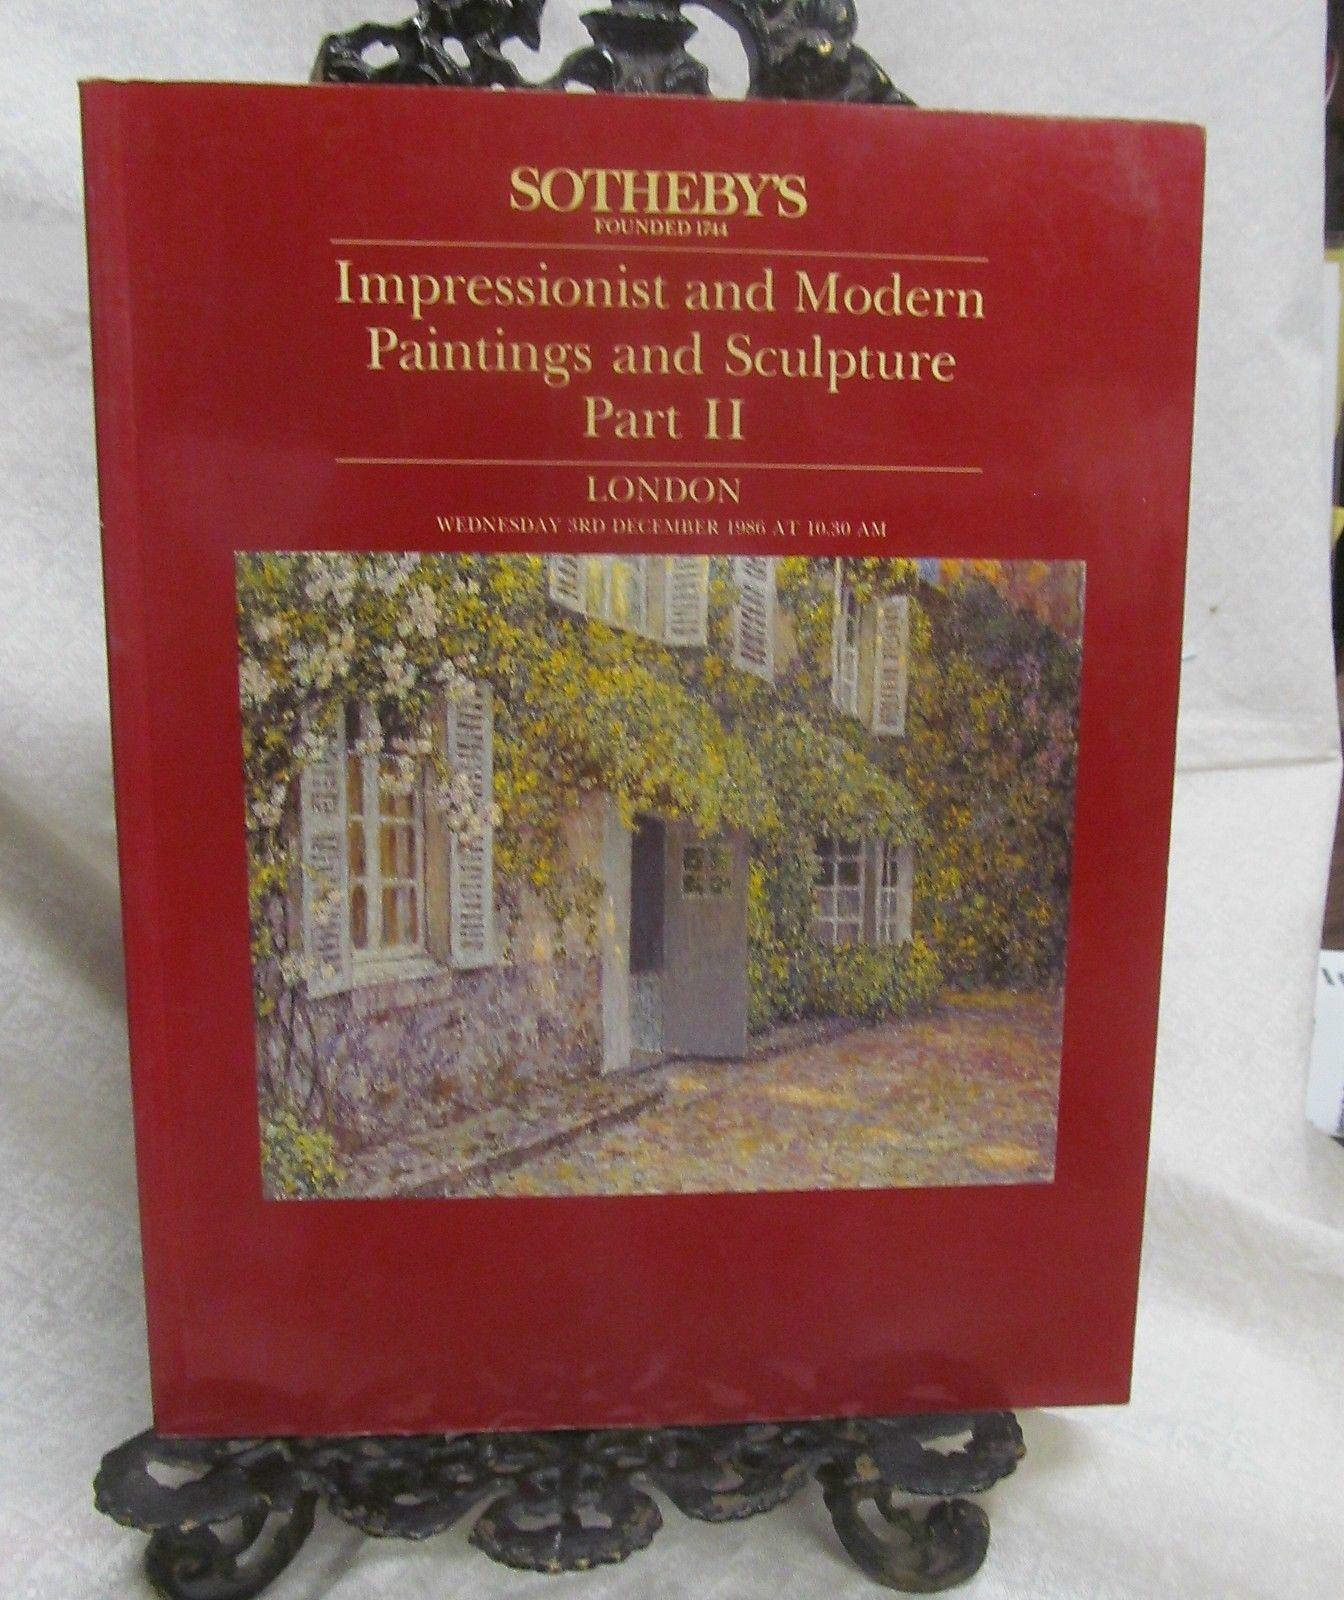 Sotheby's Sale December 1986 Sales Catalog Part II